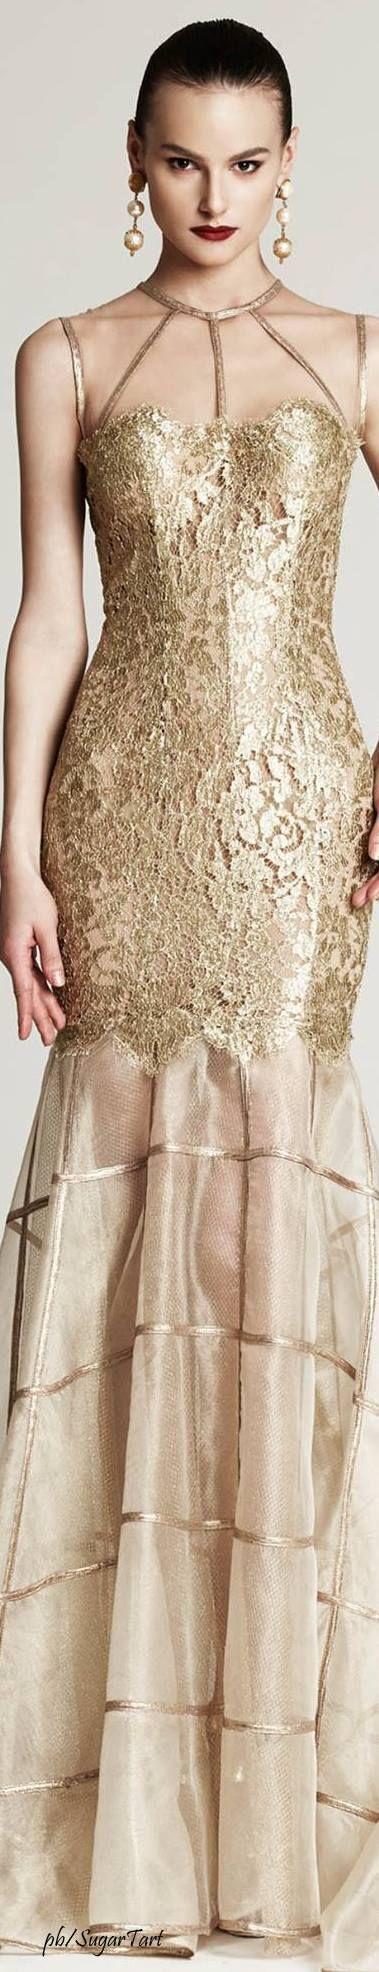 Cristina Savulescu FW 2015-16 women fashion outfit clothing style apparel @roressclothes closet ideas